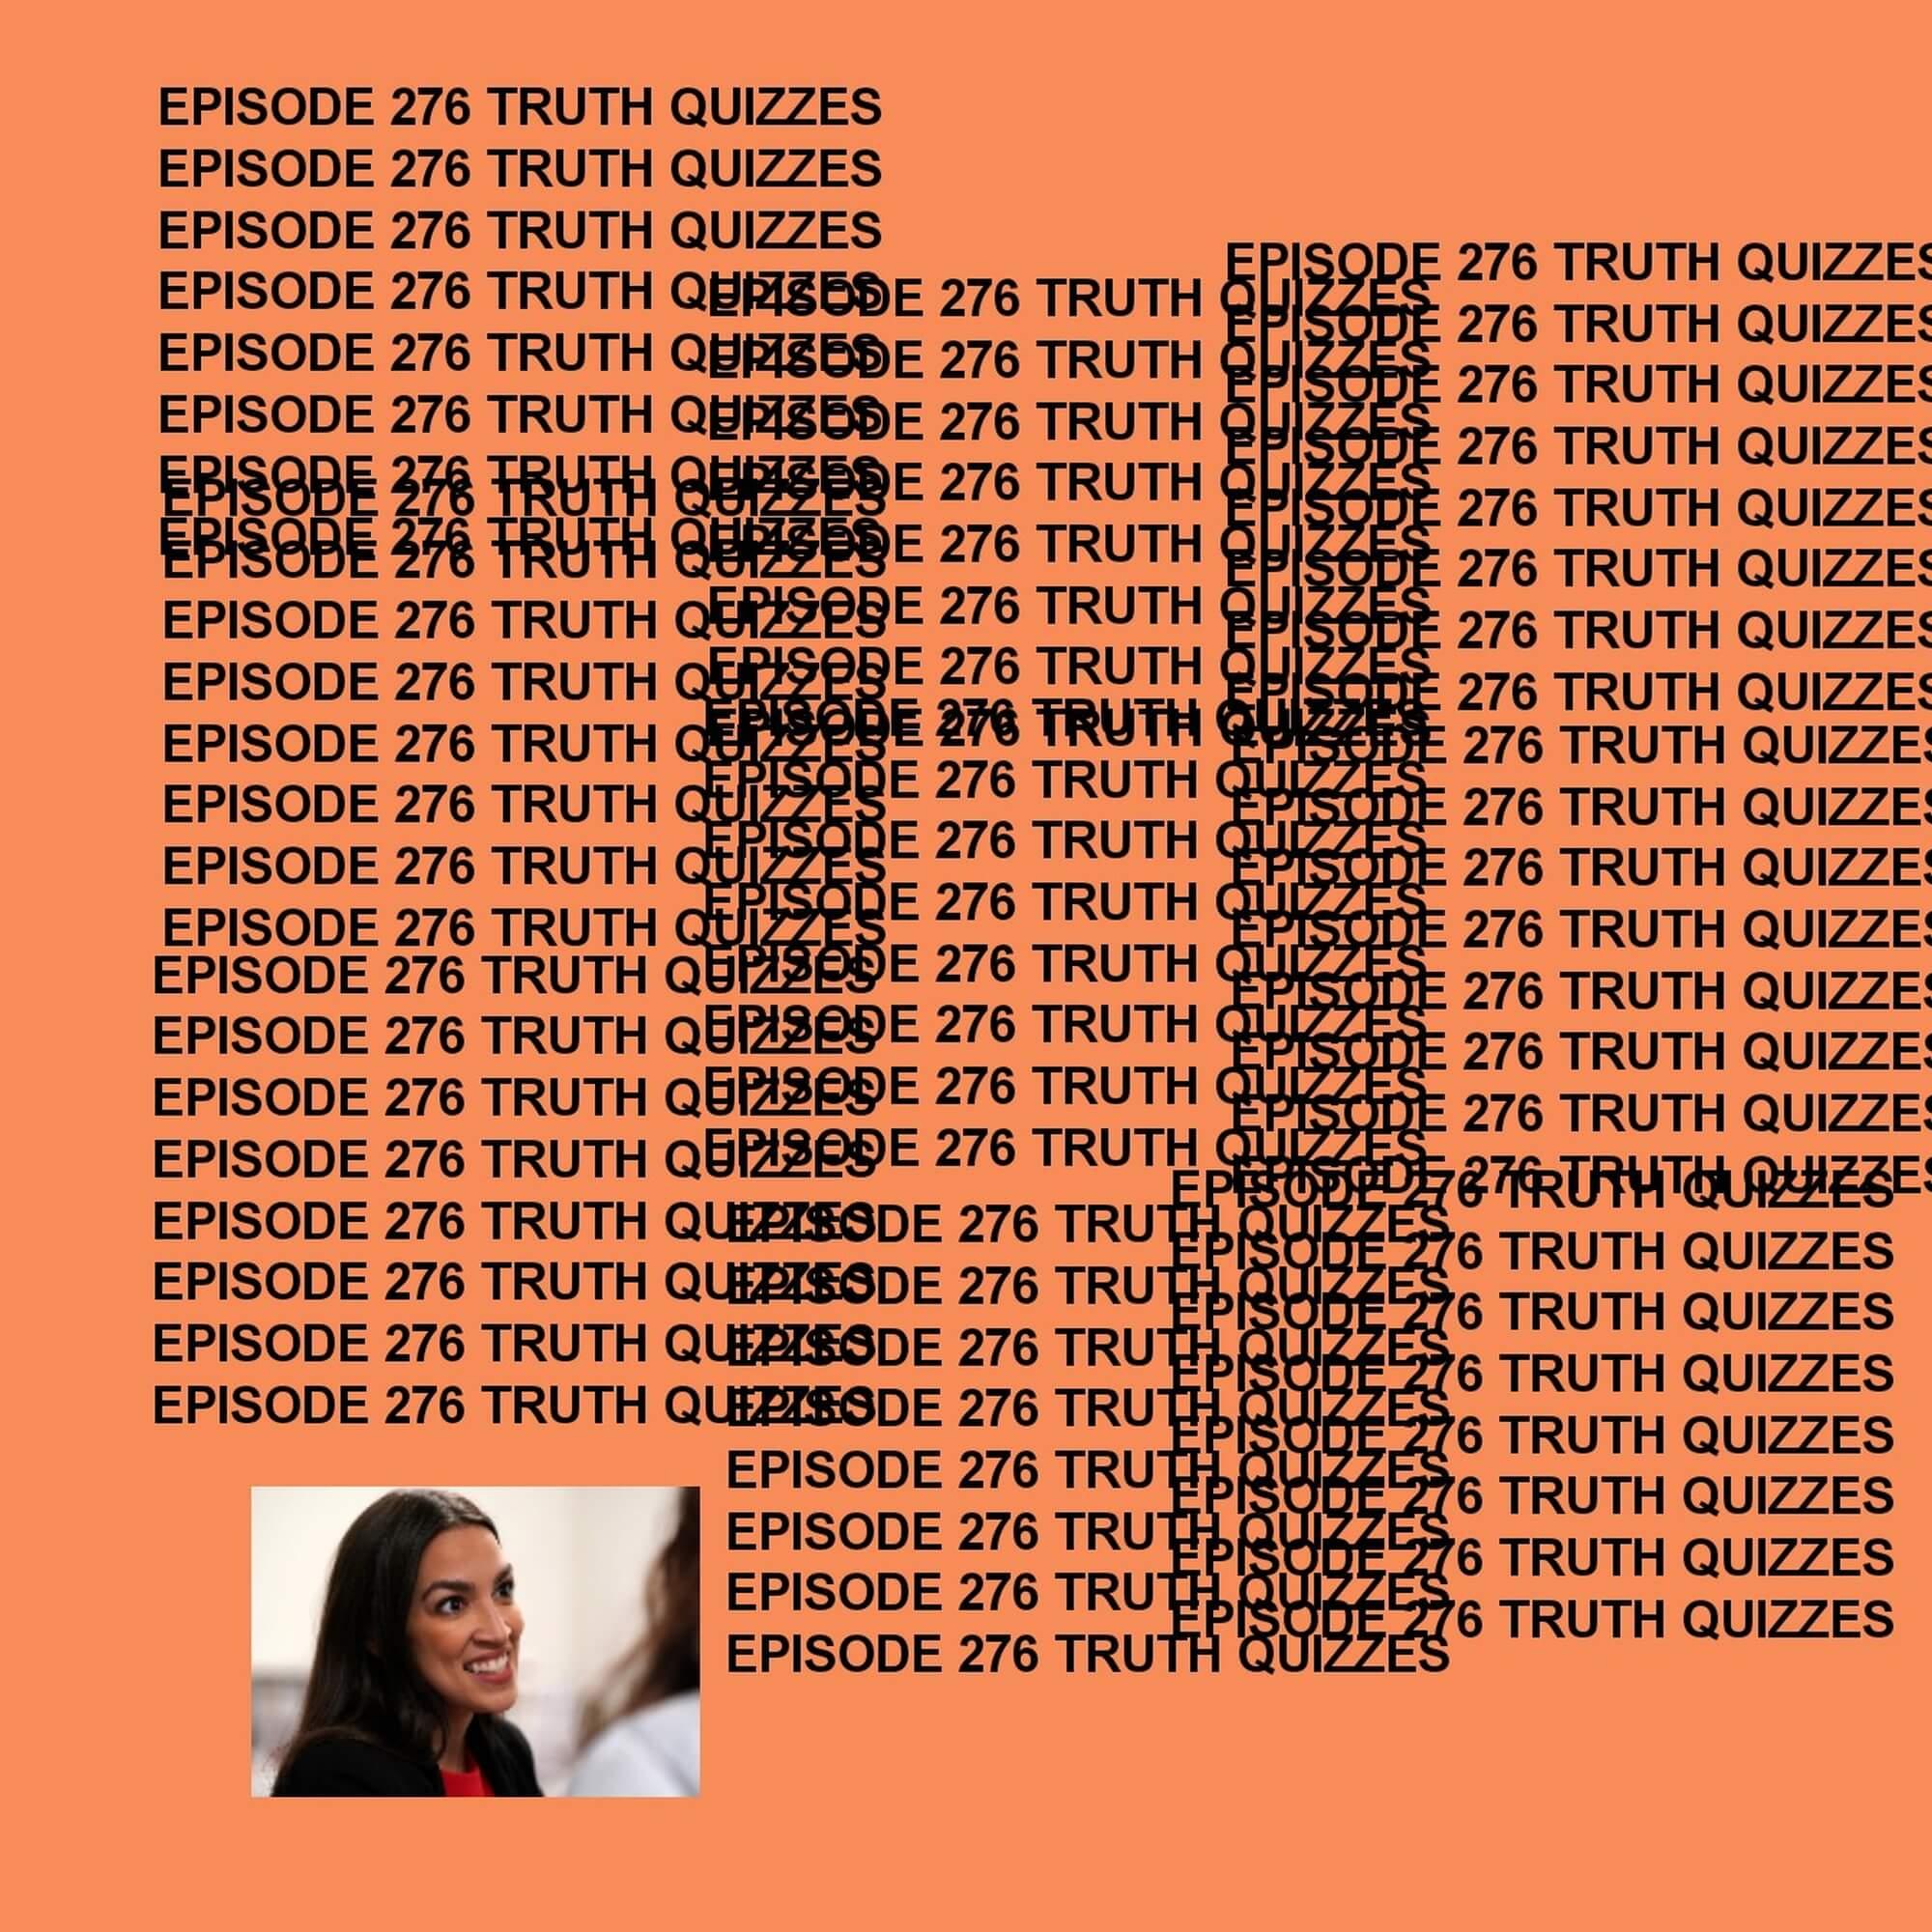 GTST Episode 276: Truth Quizzes